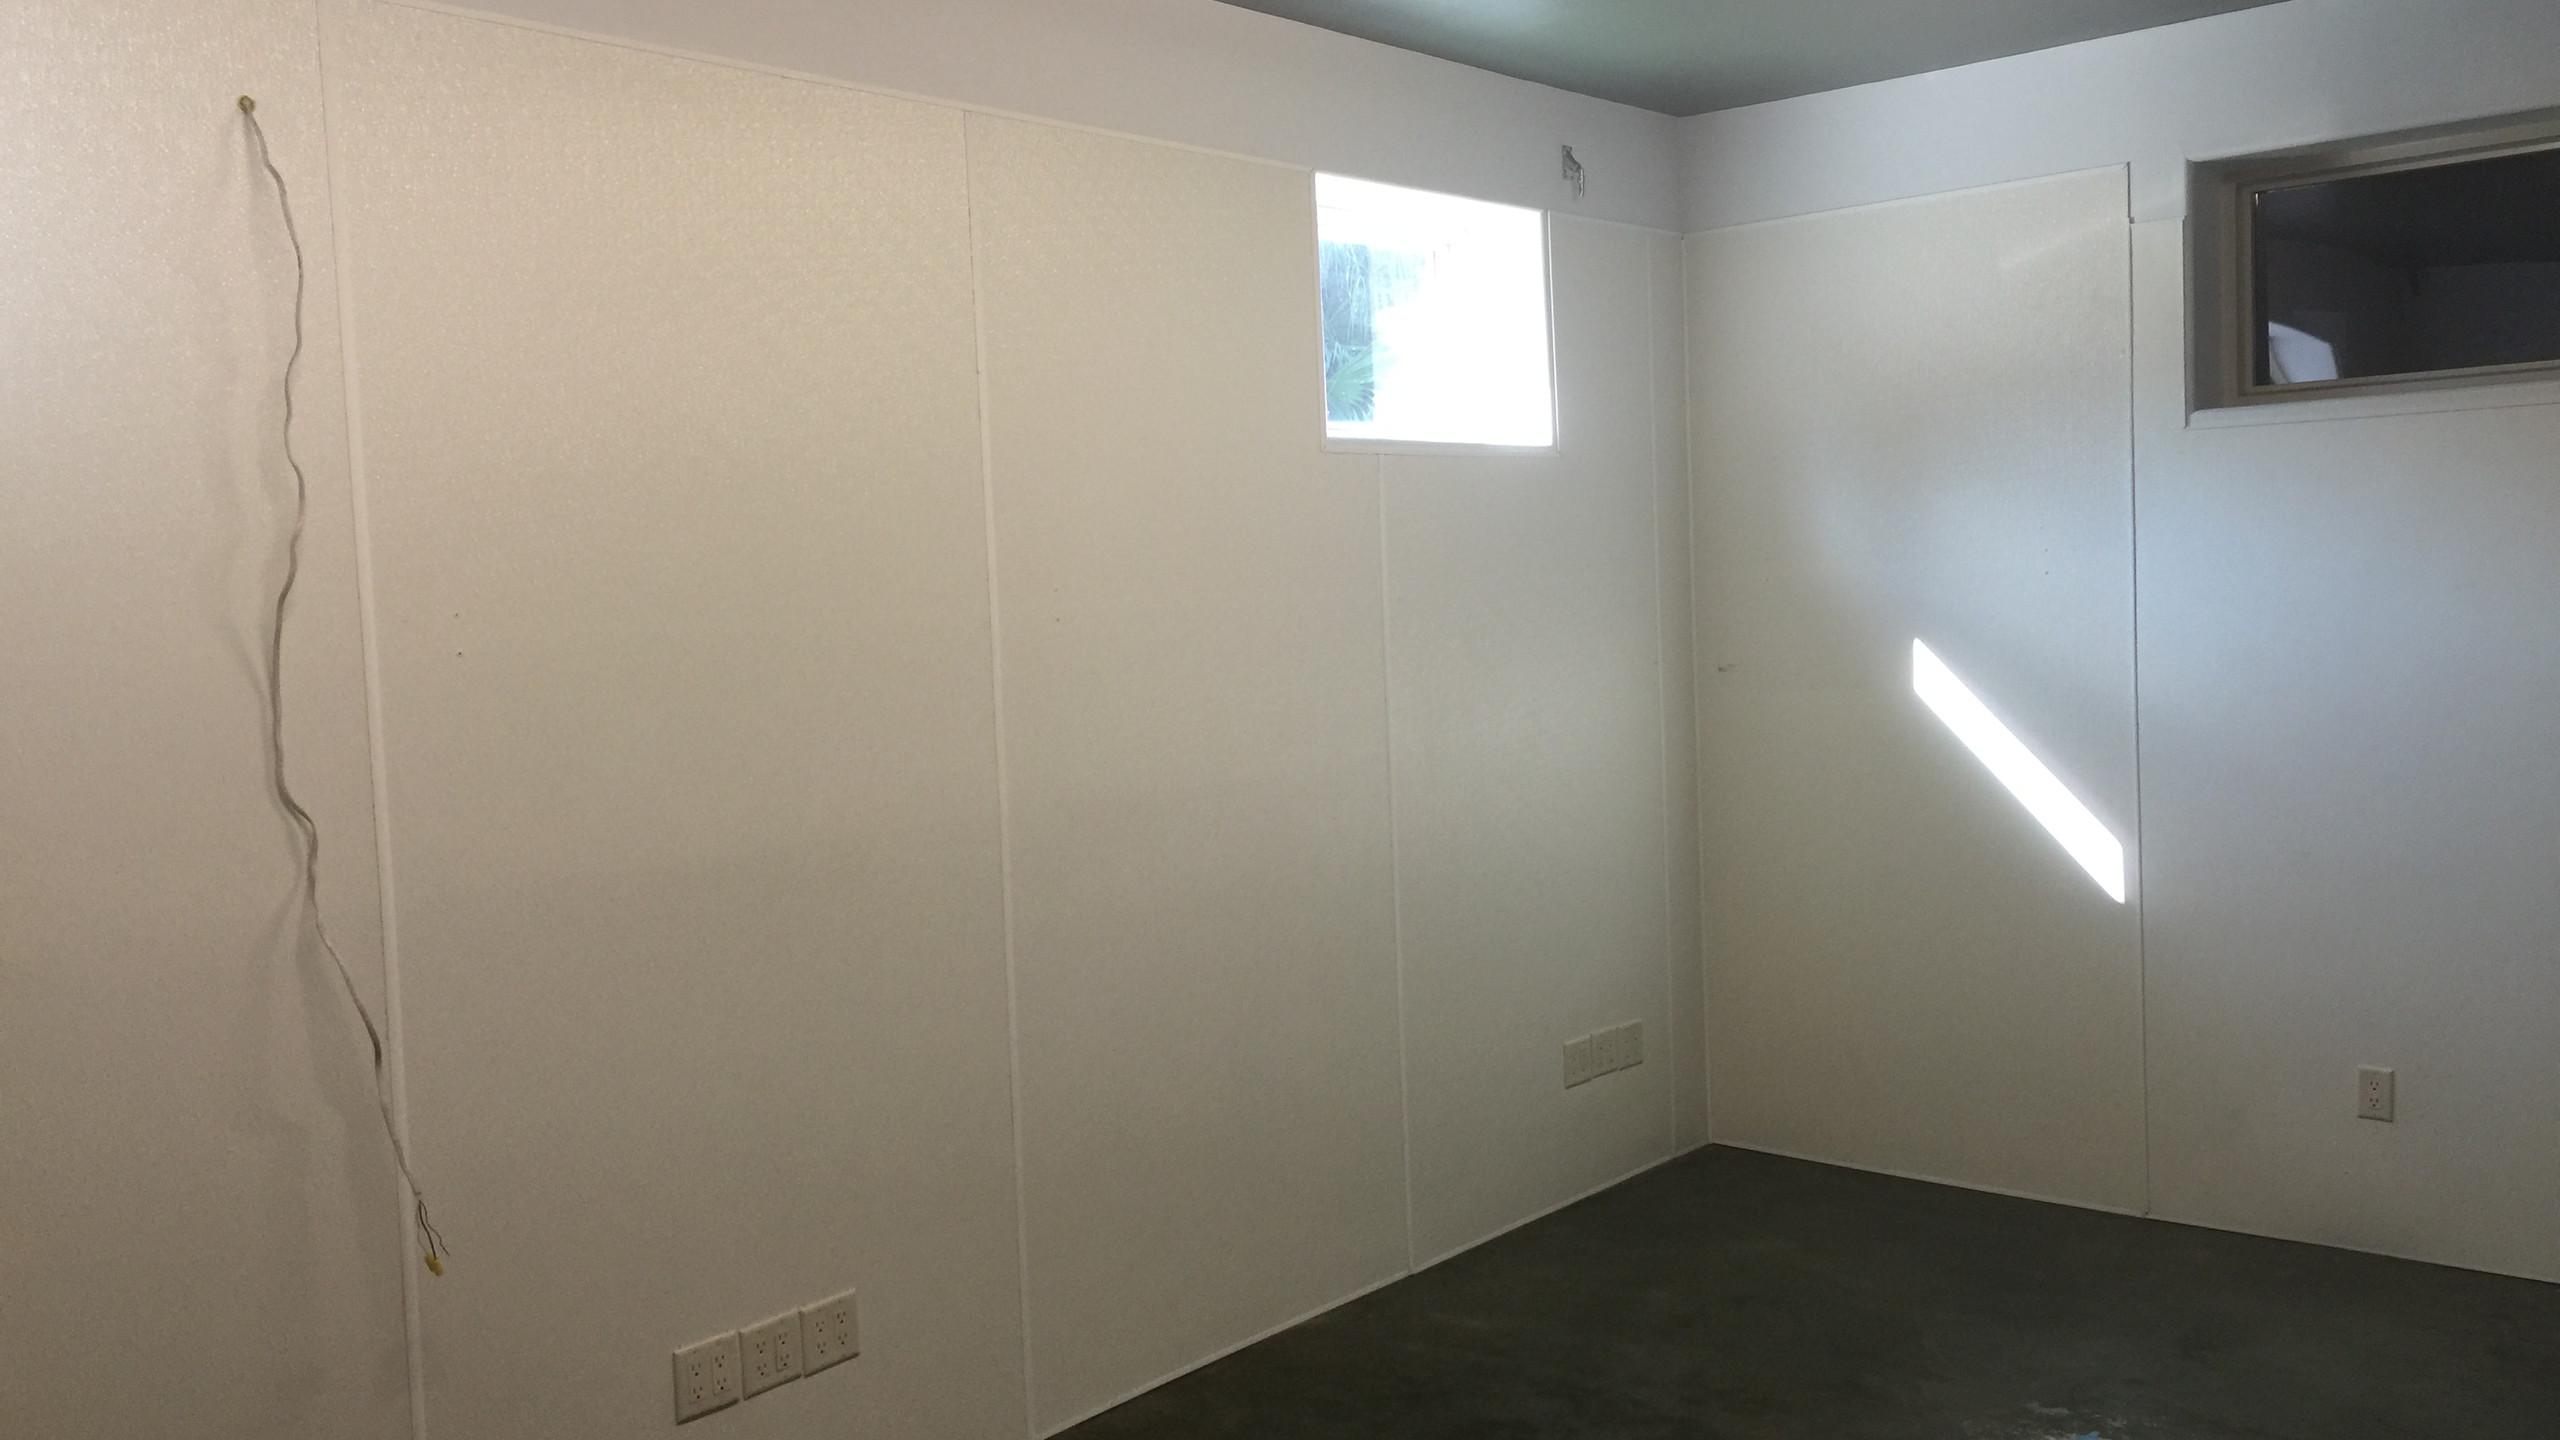 3-Room is Emptied